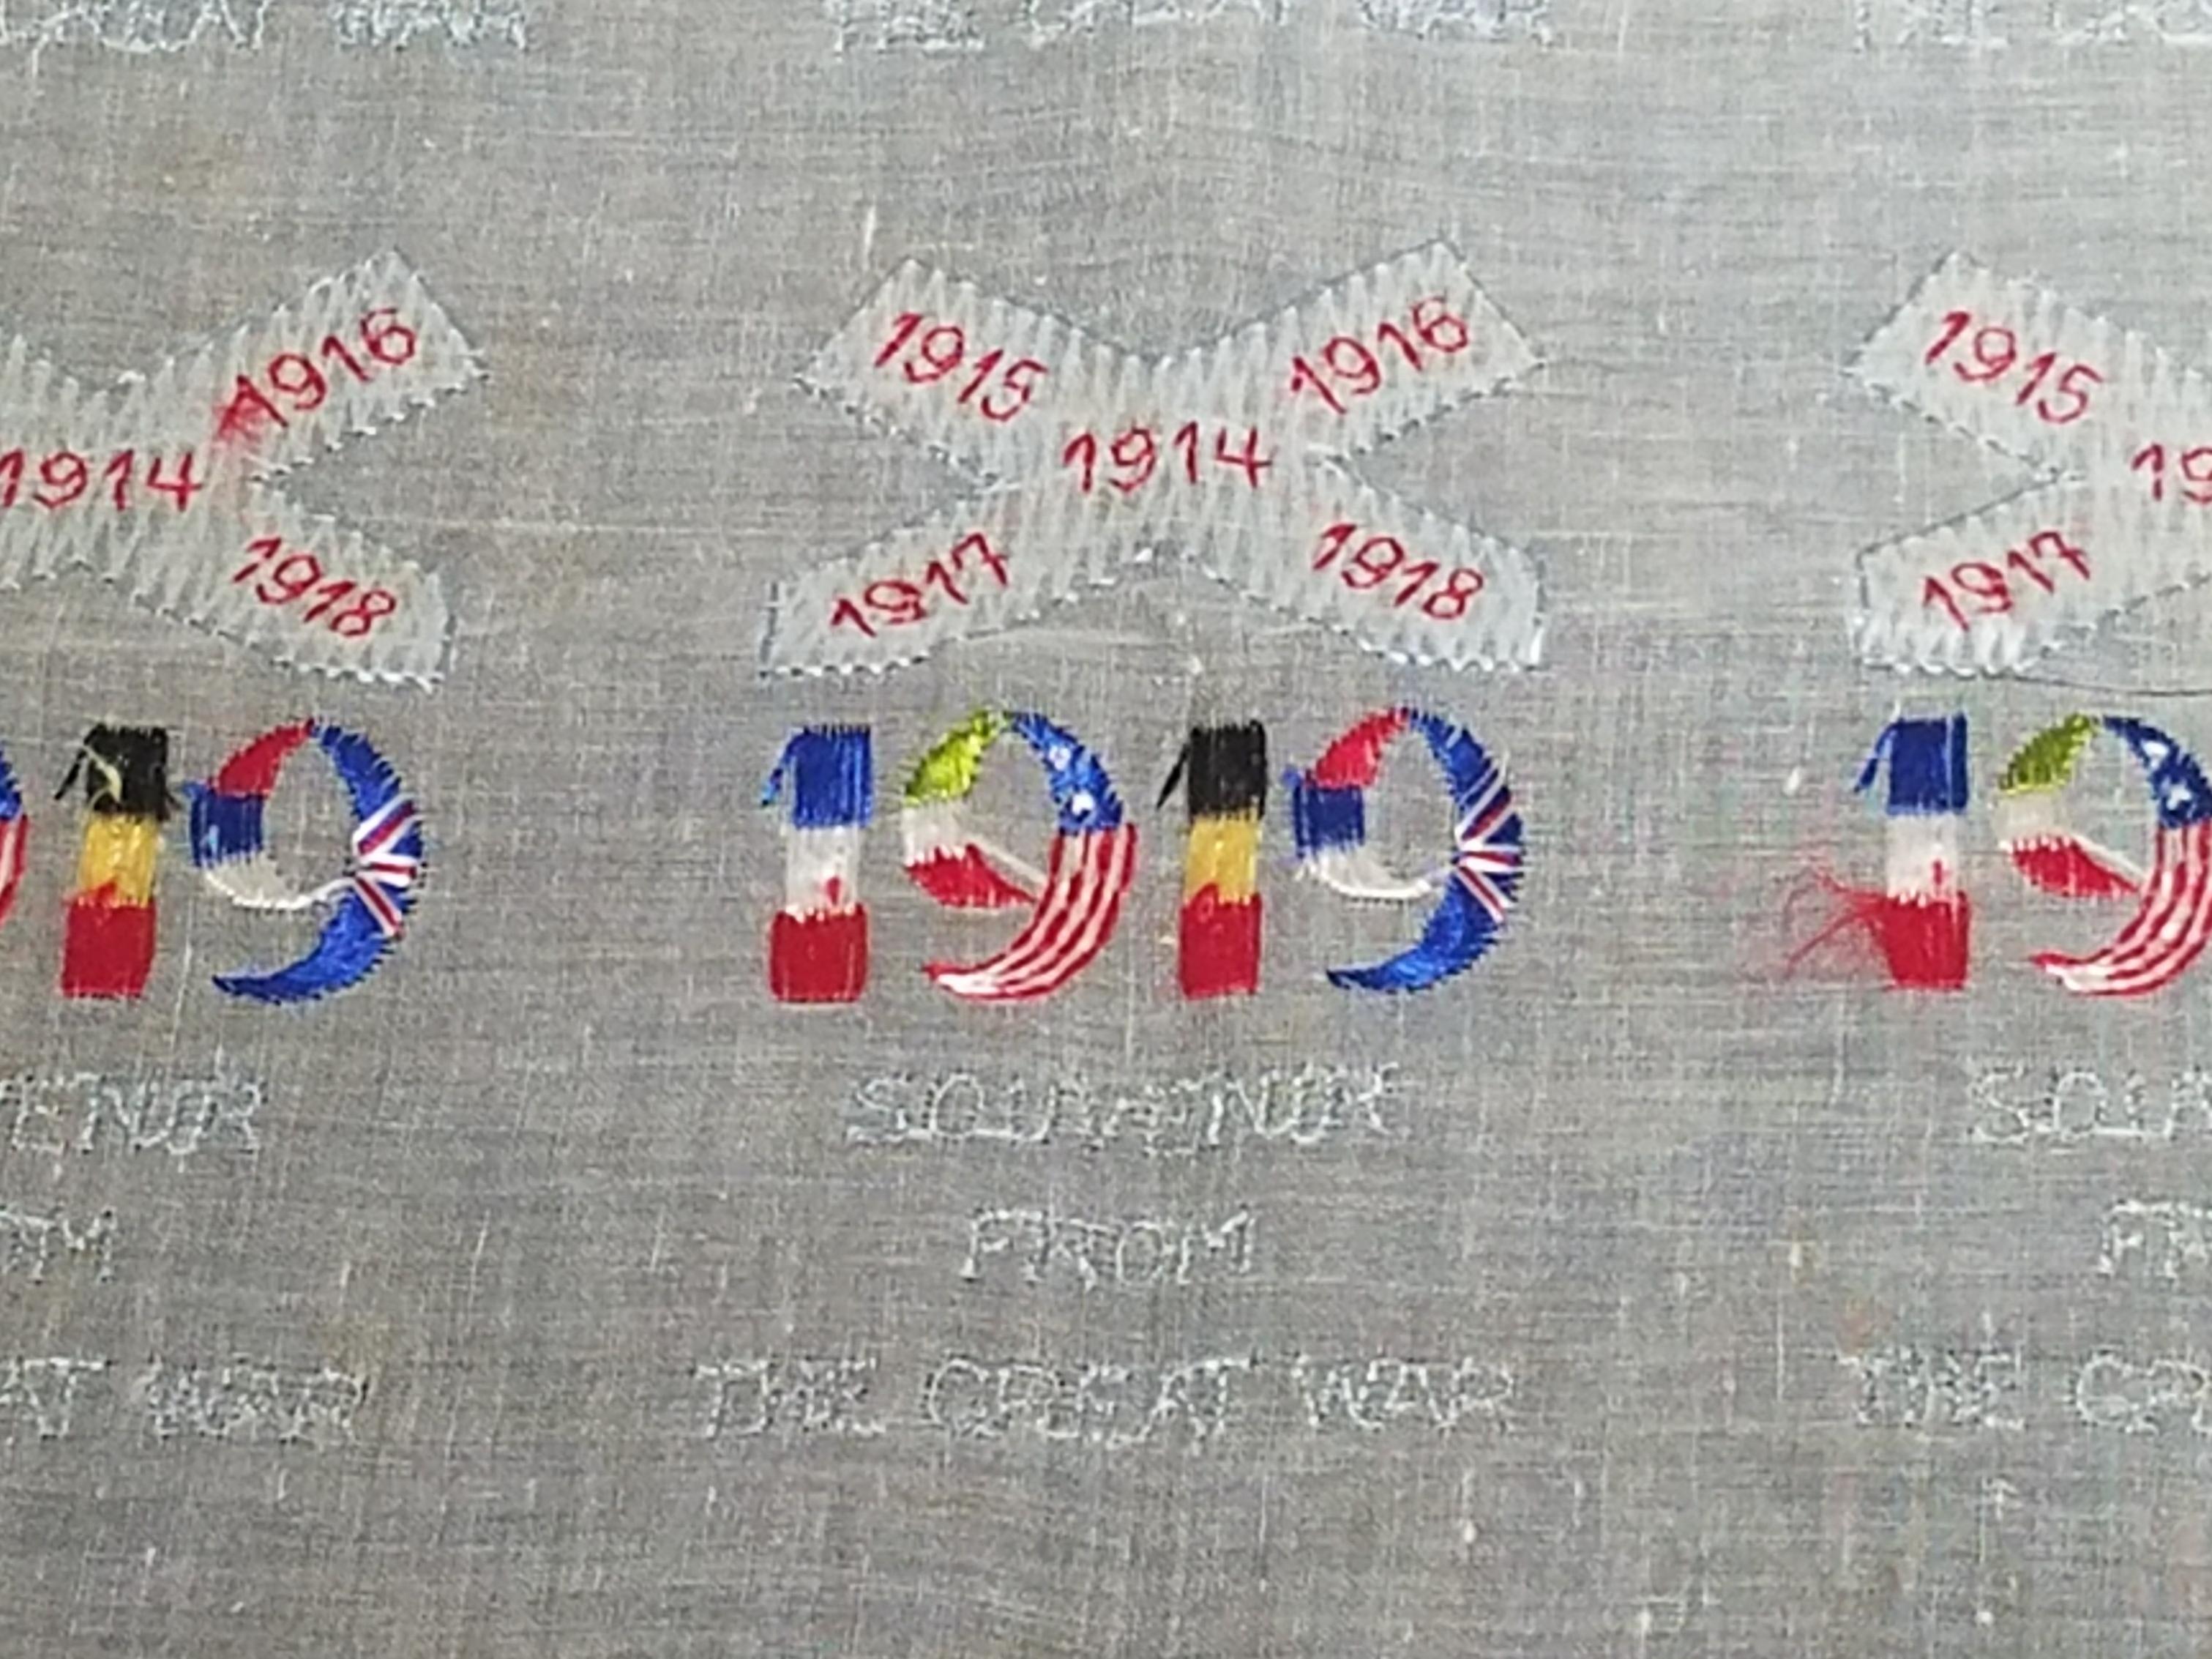 1919 souvenir